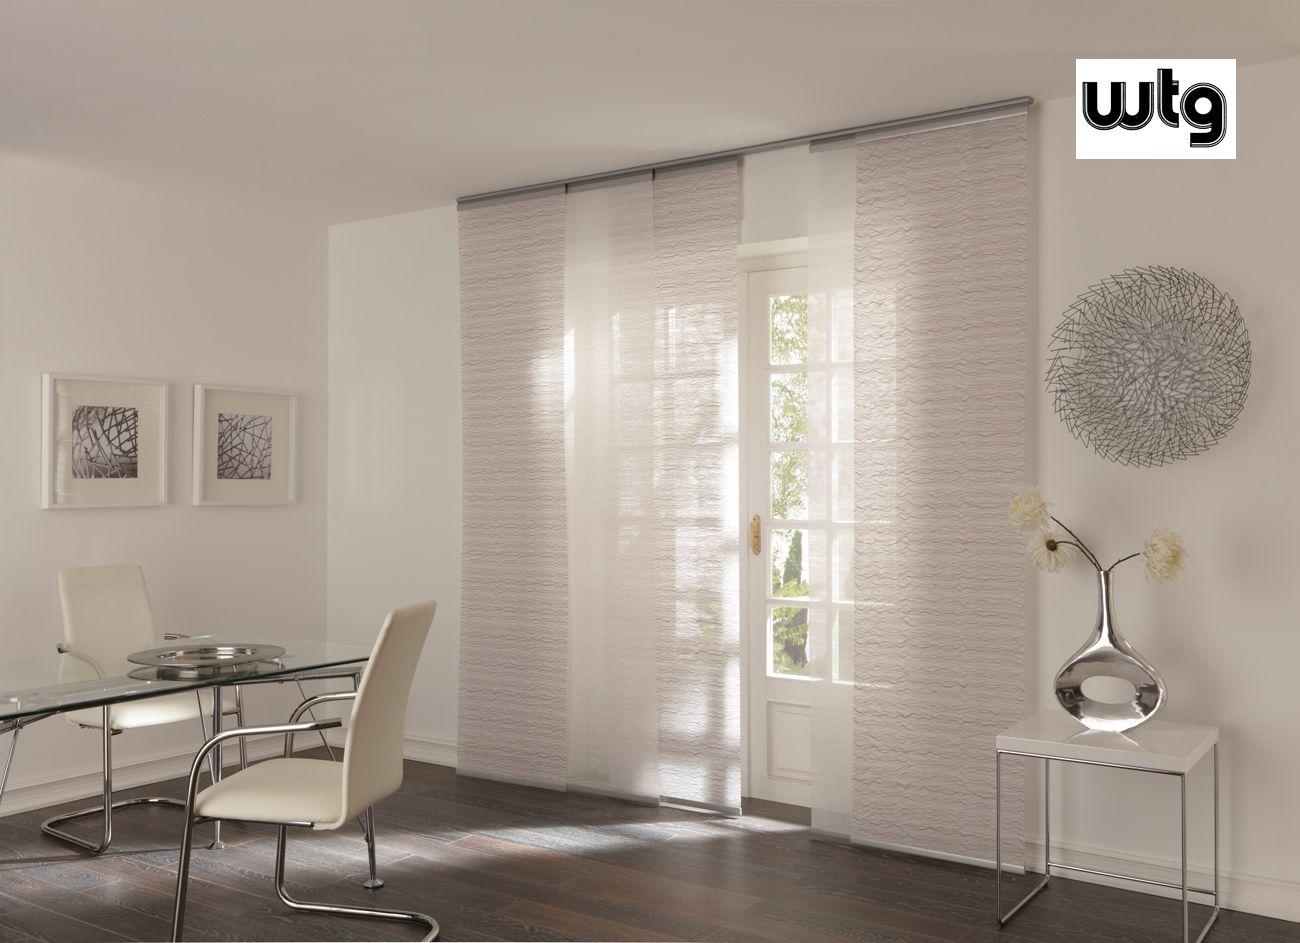 Westfälische Textilgesellschaft Klingenthal & Co. mbH